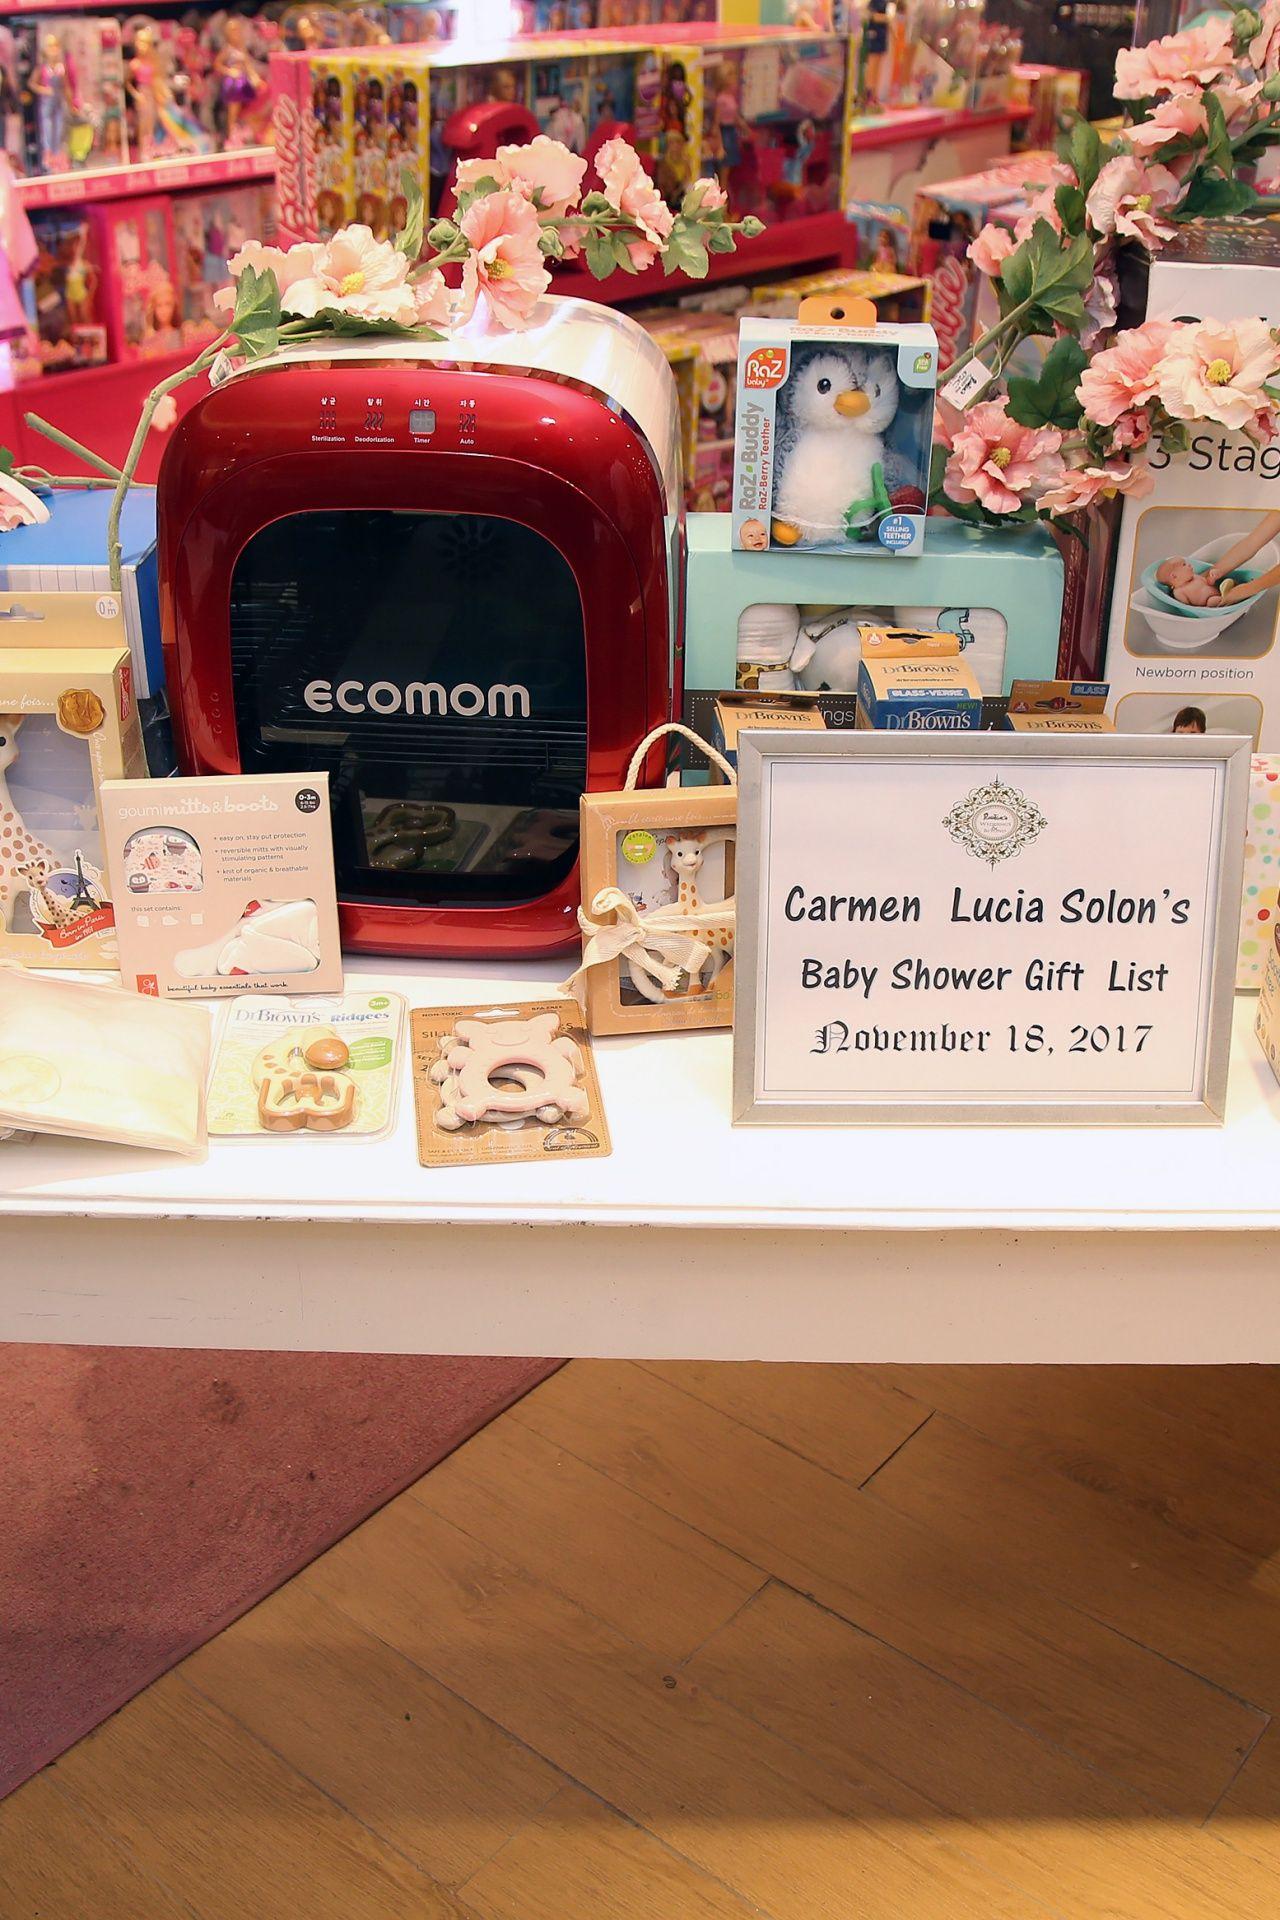 Carmen Lucia Solon's Registry List at Rustan's Gift Registry